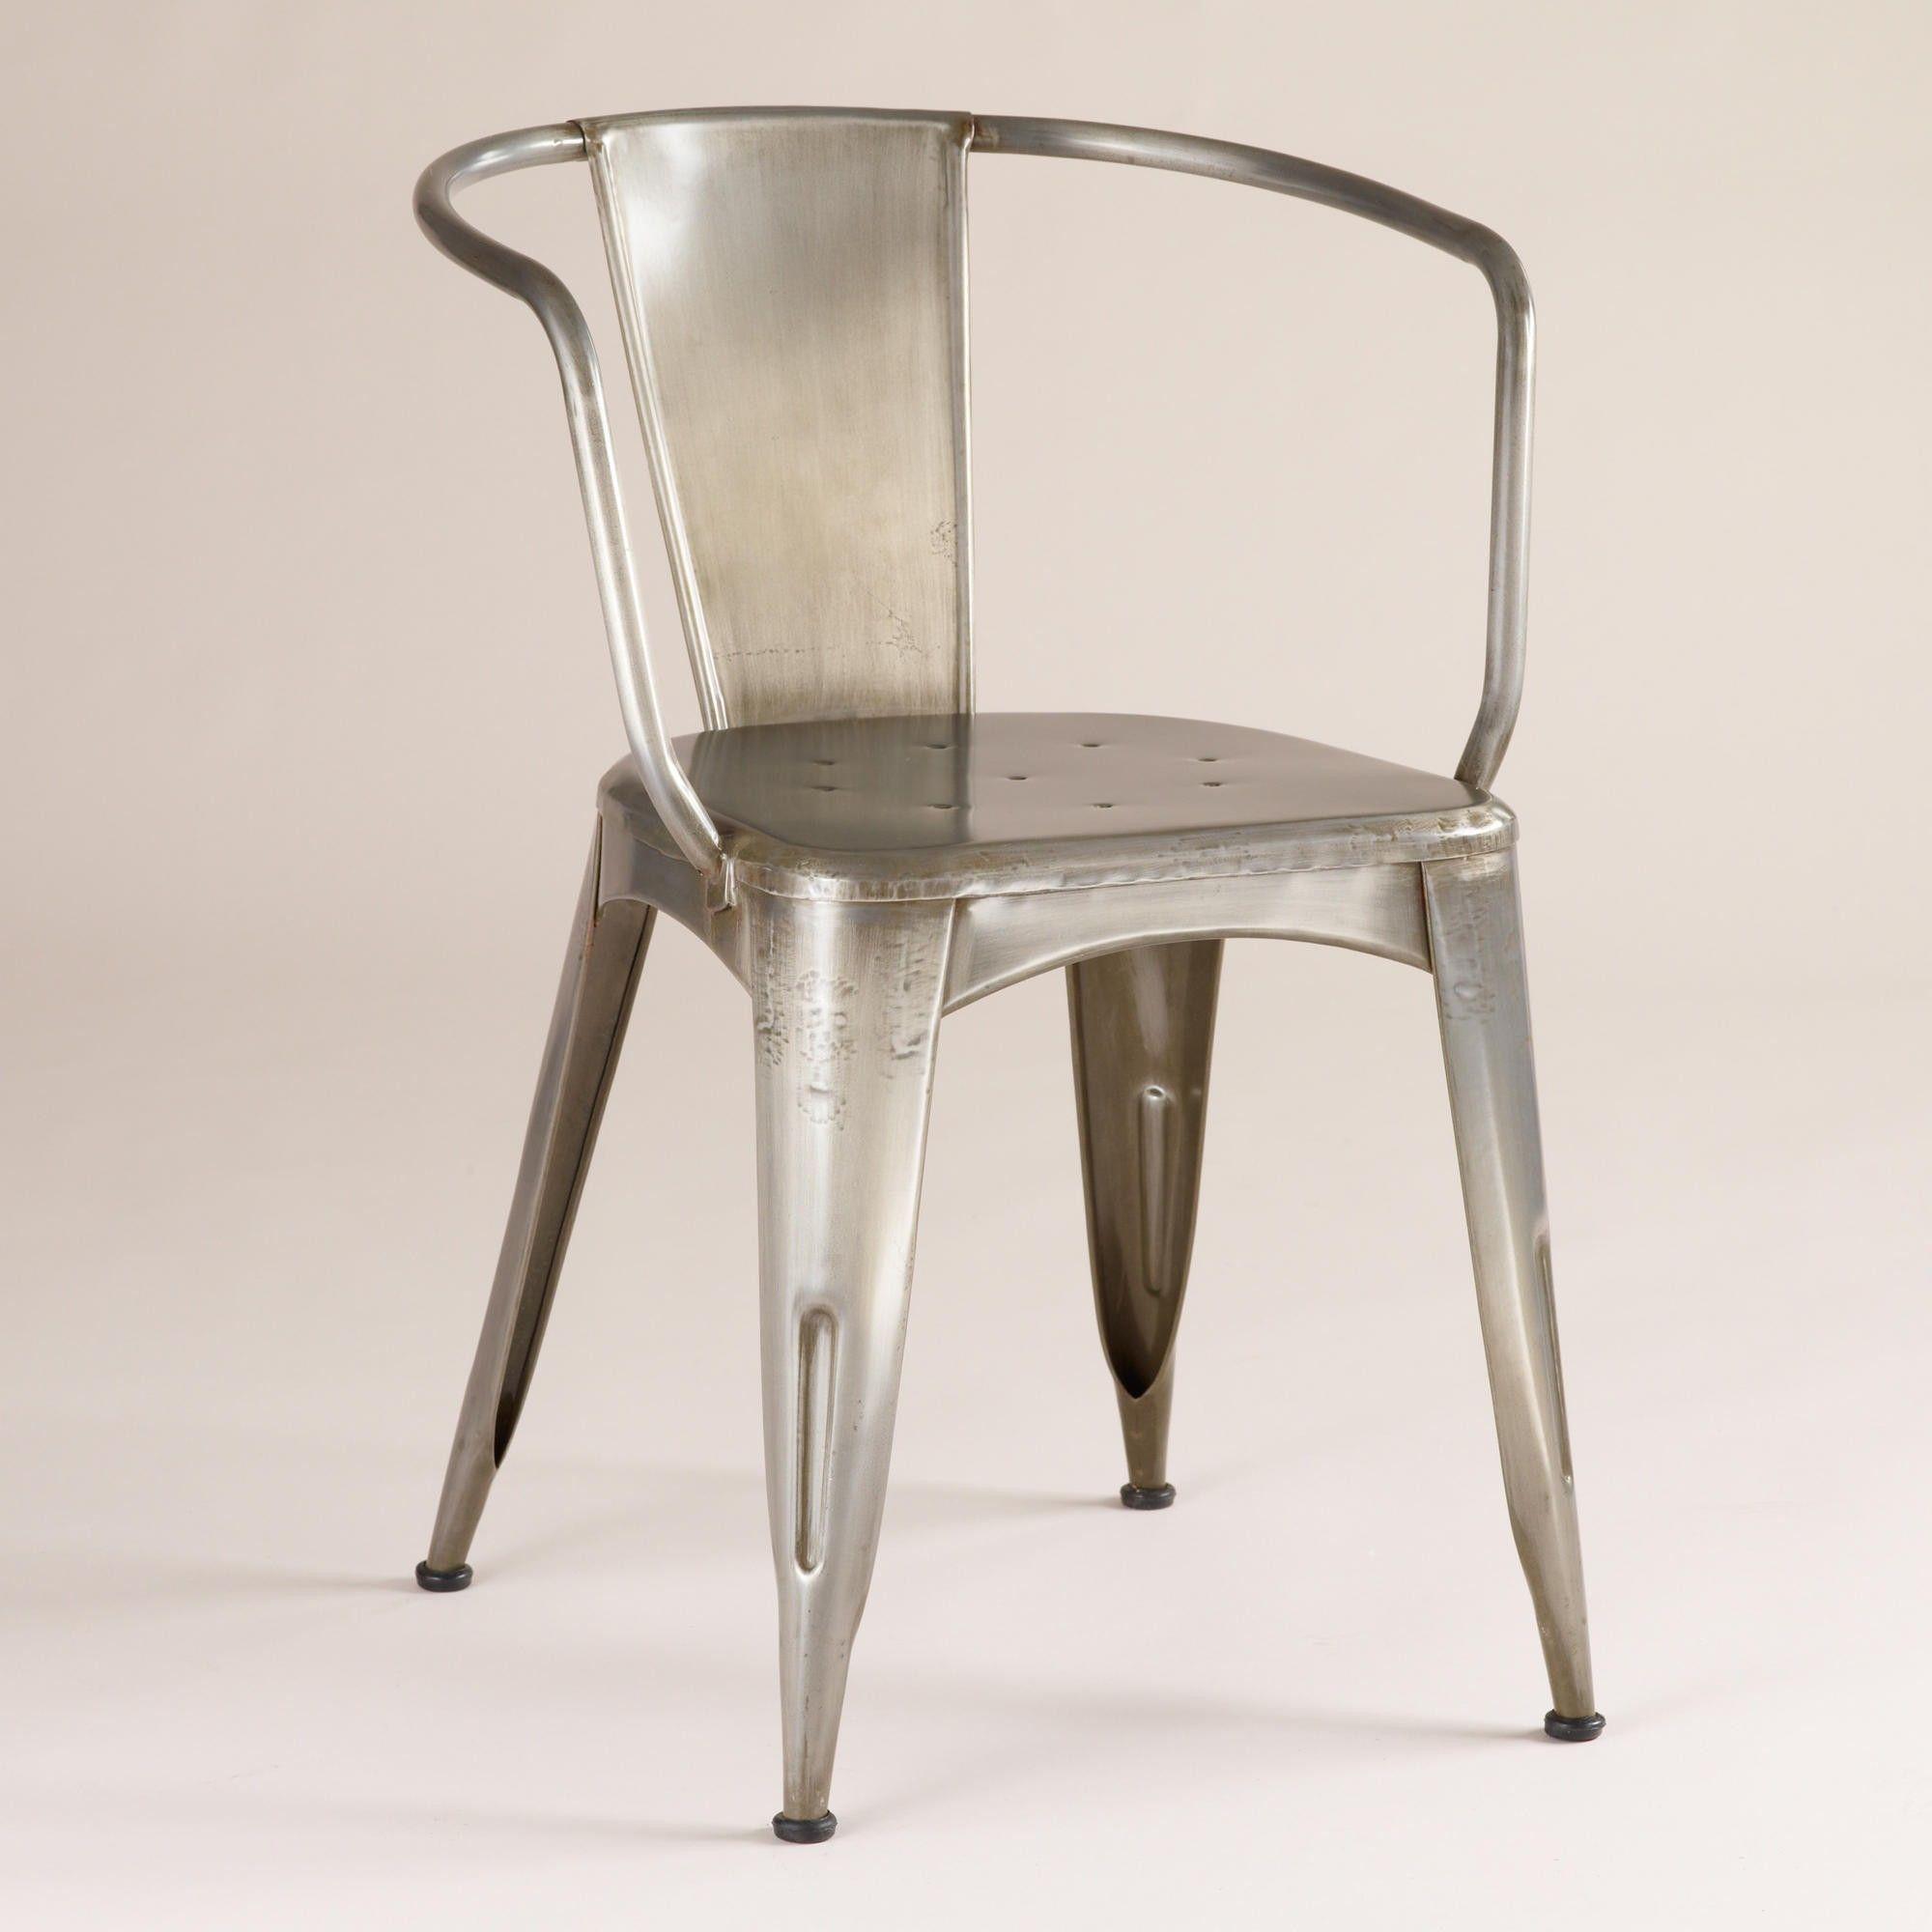 Luxury World Market Metal Chairs - world market metal chairs